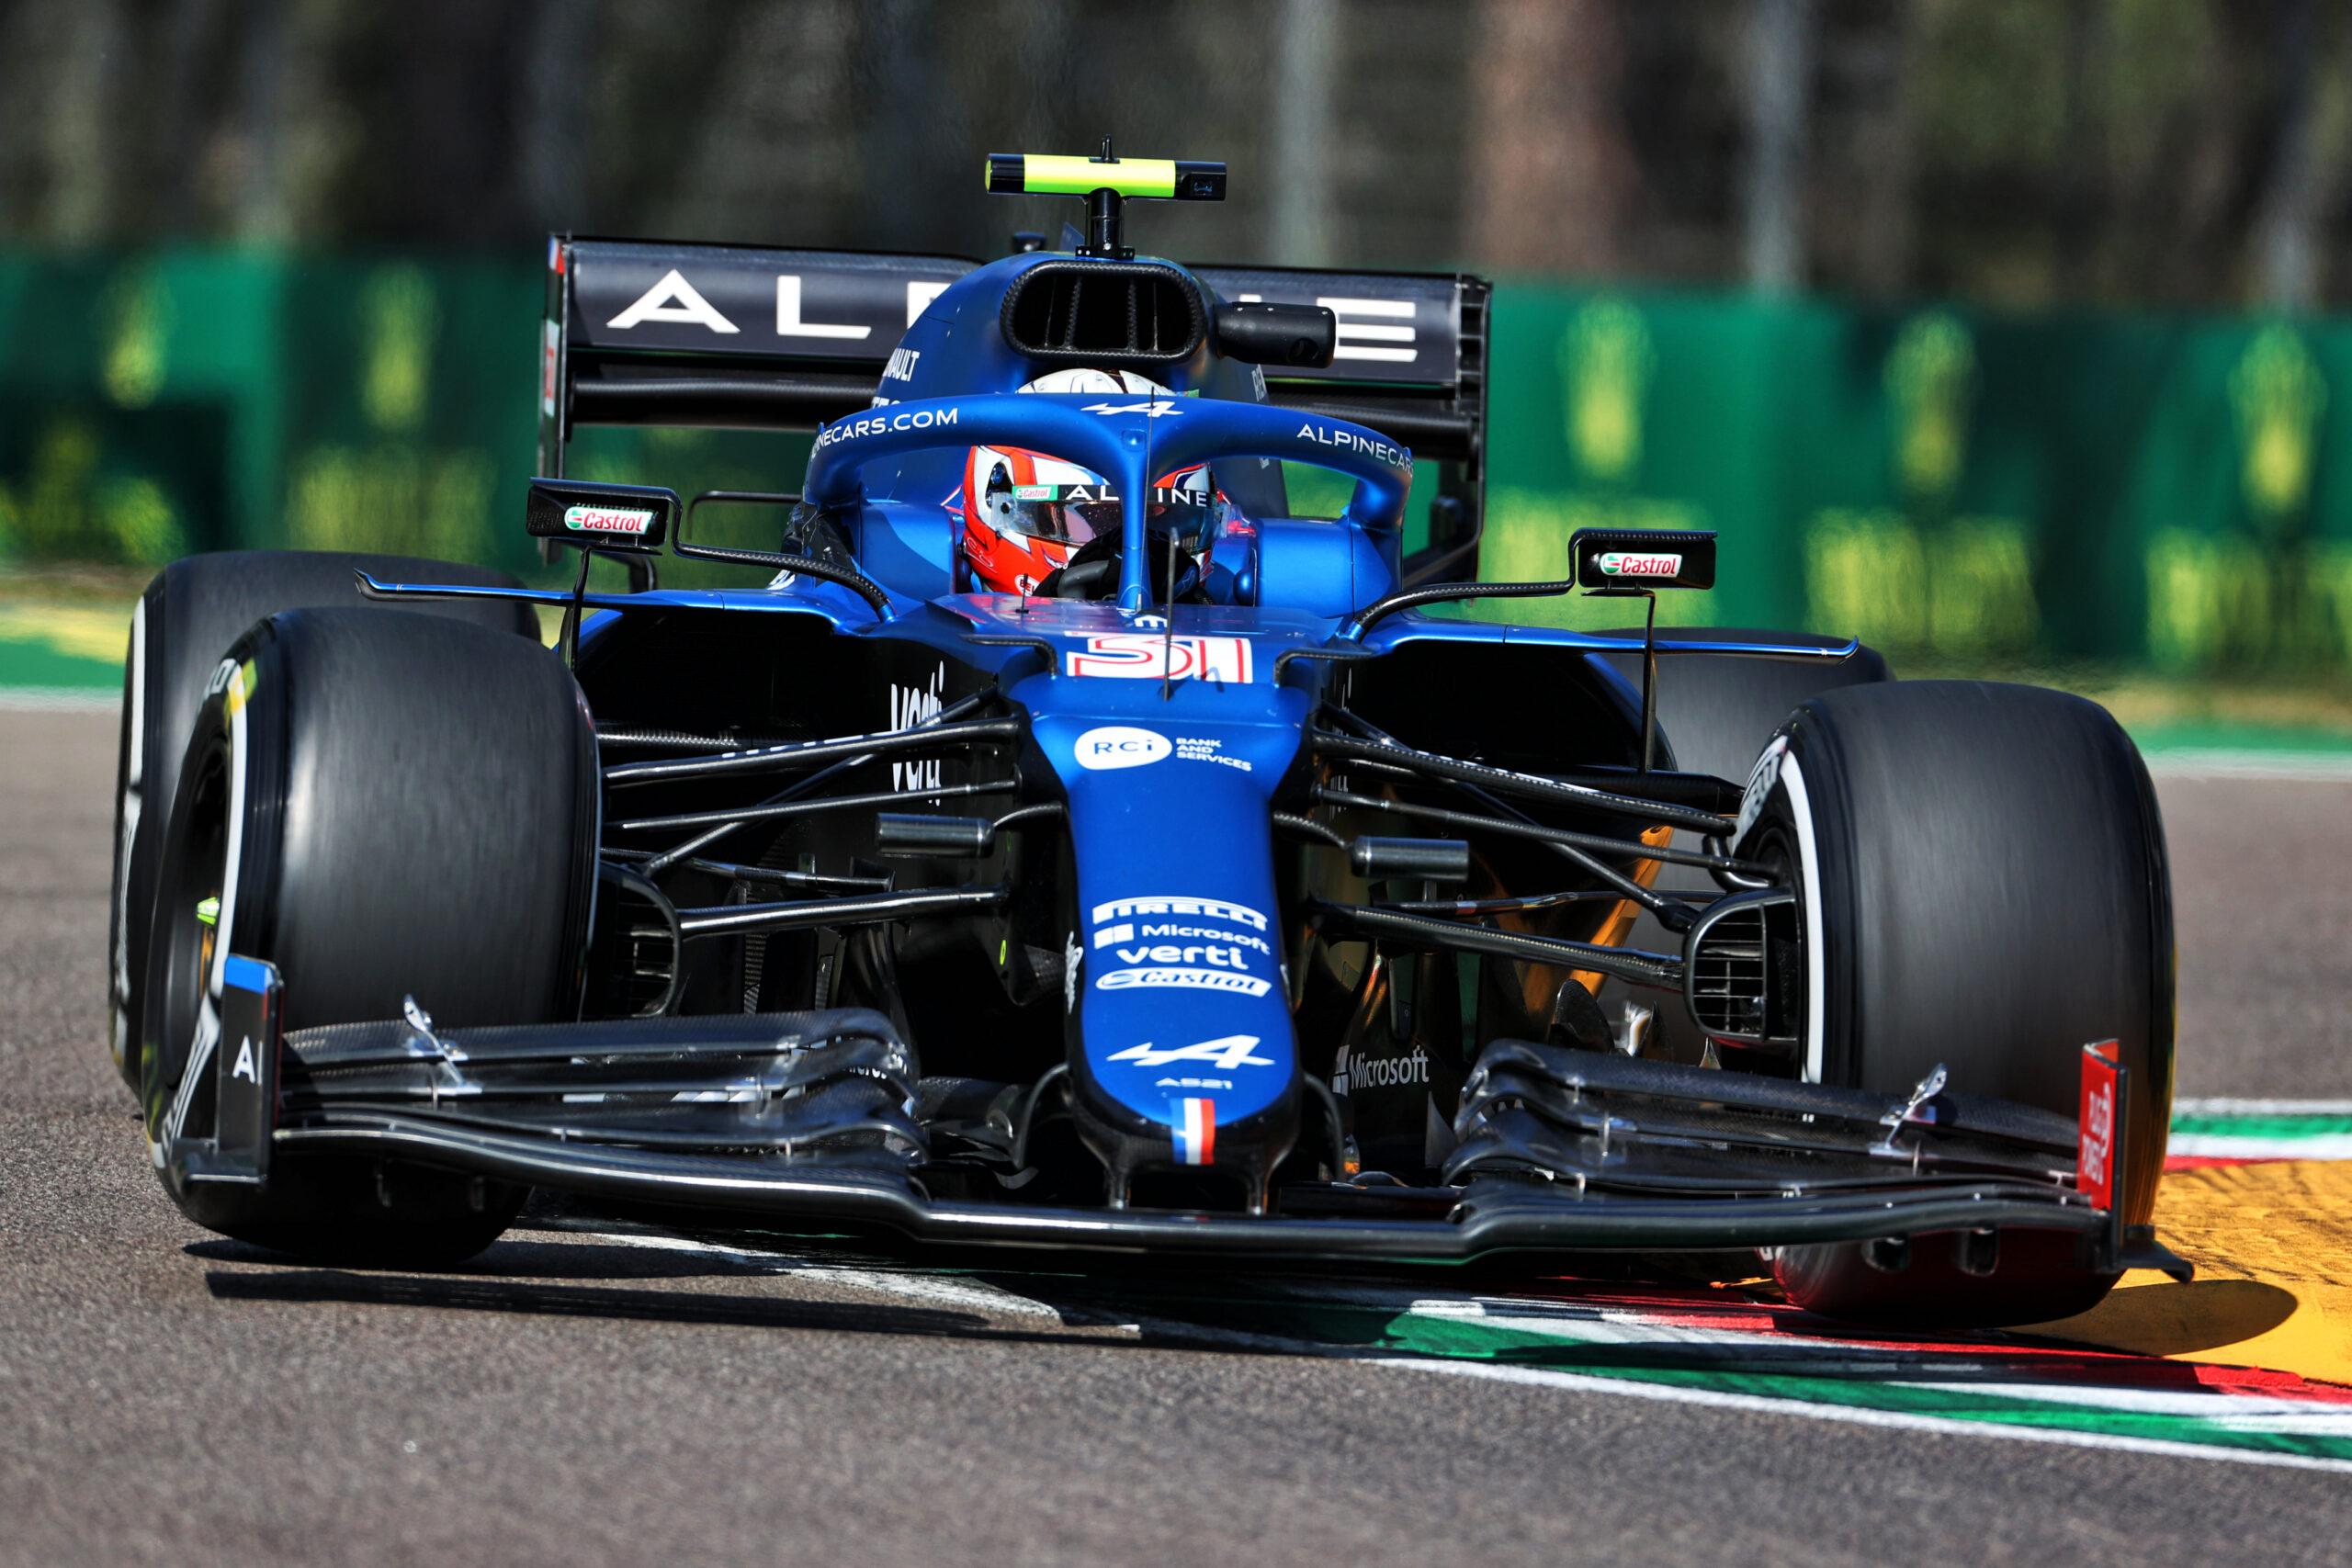 F1 - Alpine a connu un vendredi productif malgré un incident impliquant Ocon